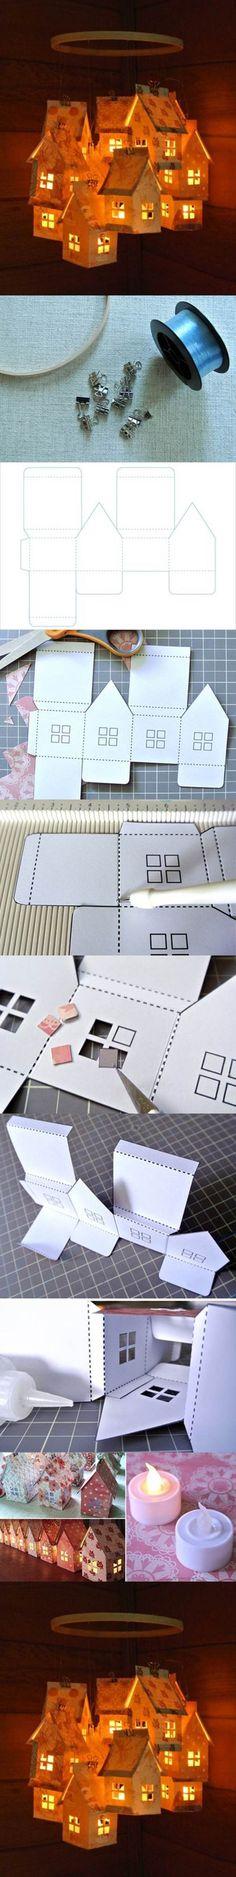 DIY Cardboard Small Village Shaped Lantern   iCreativeIdeas.com Like Us on Facebook ==> https://www.facebook.com/icreativeideas: